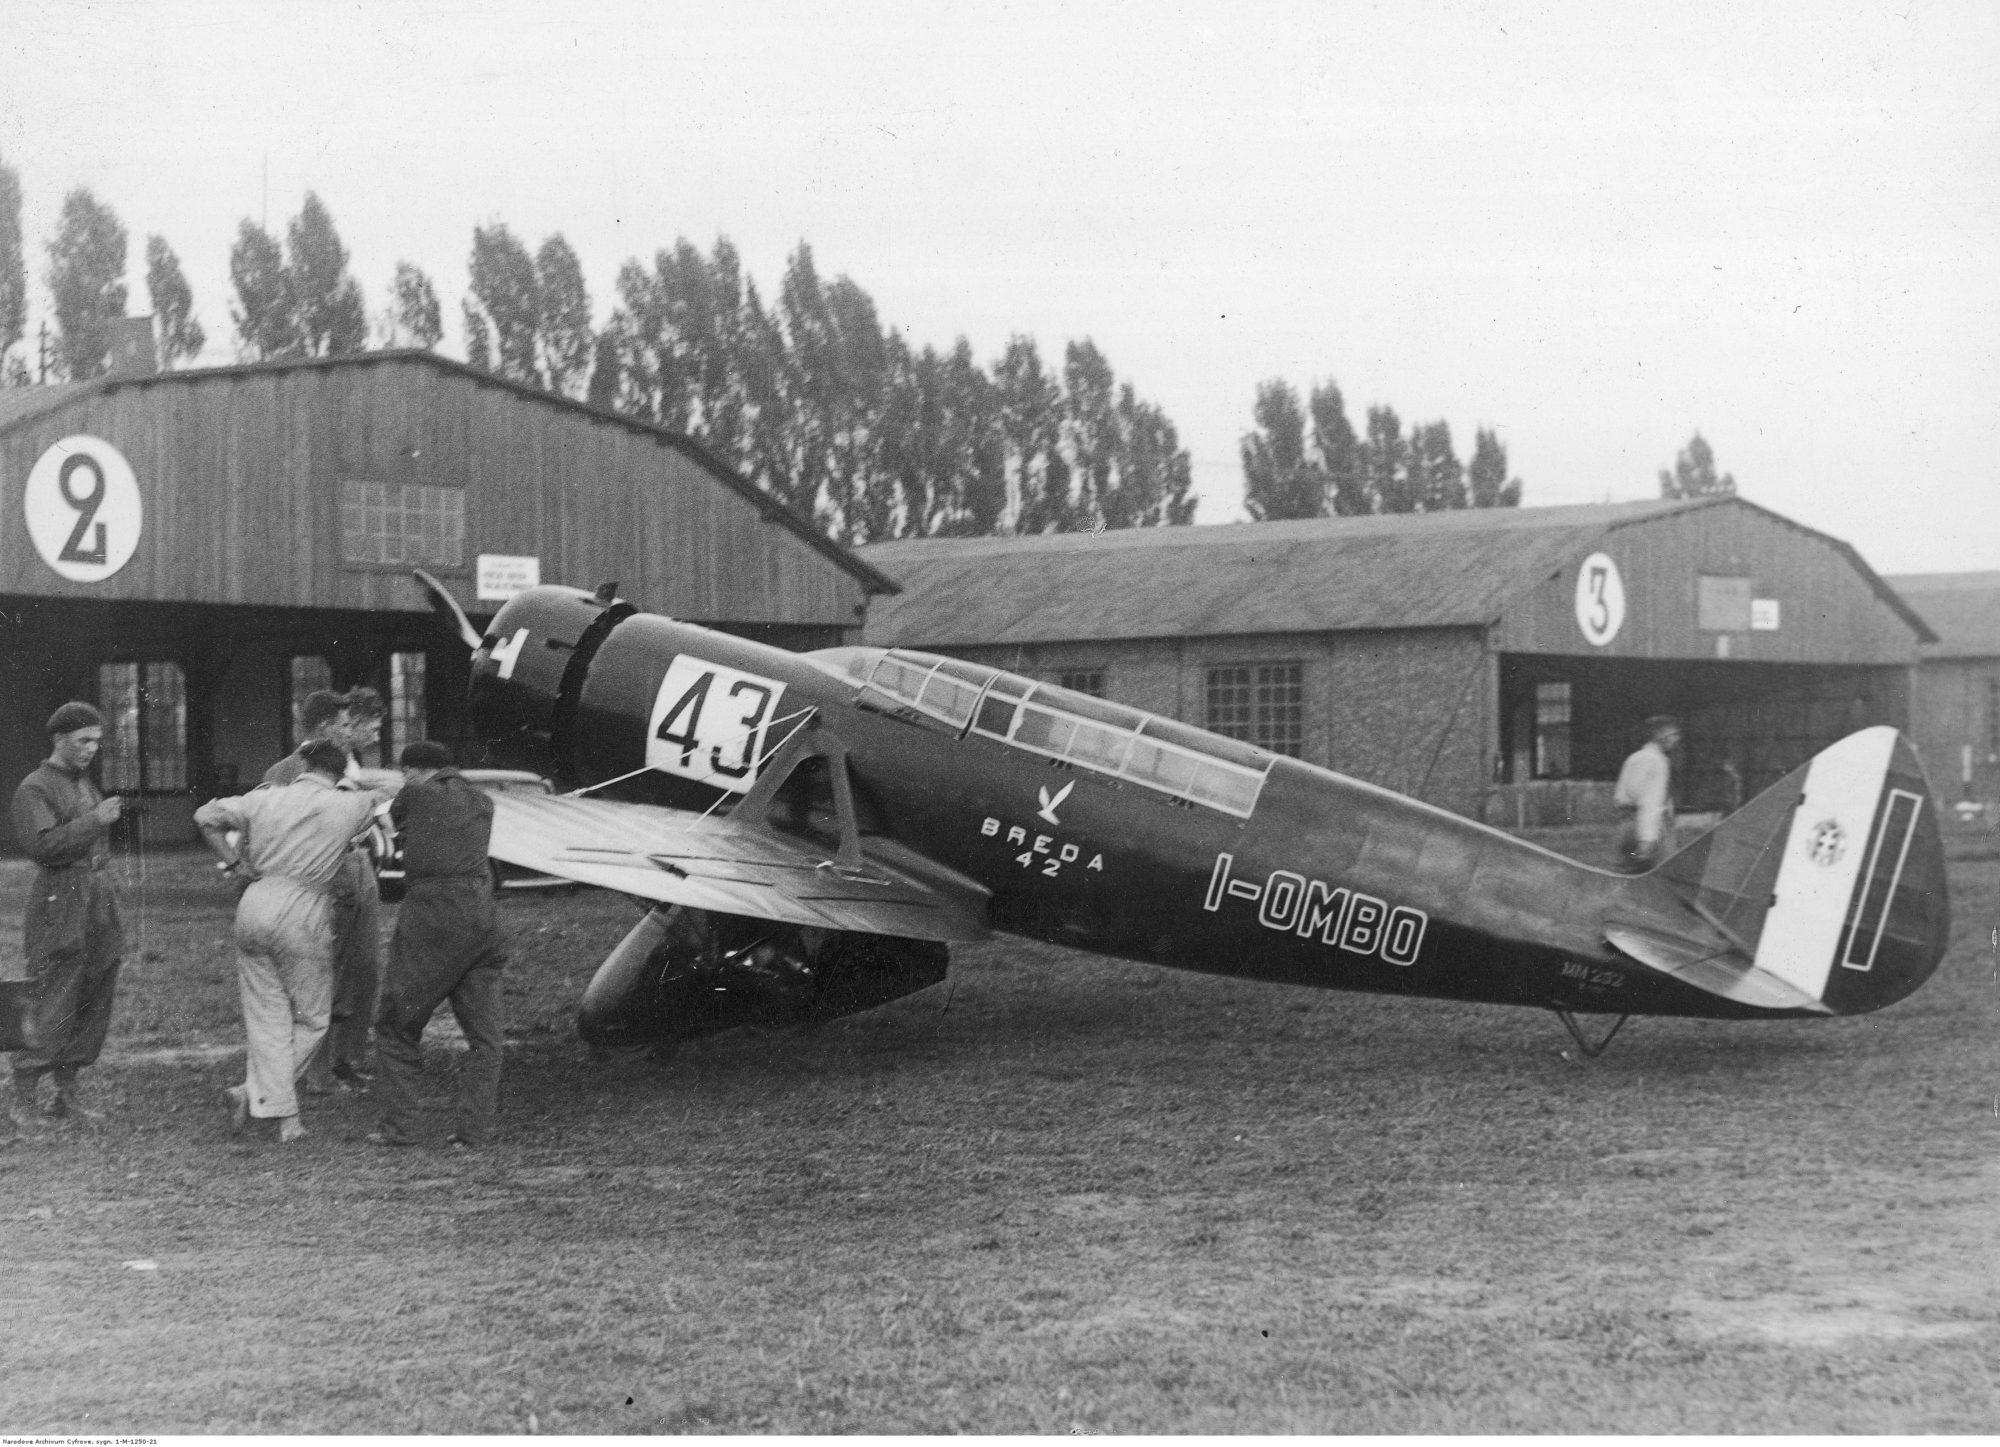 Breda 42 Aeroclub Squadratlantica